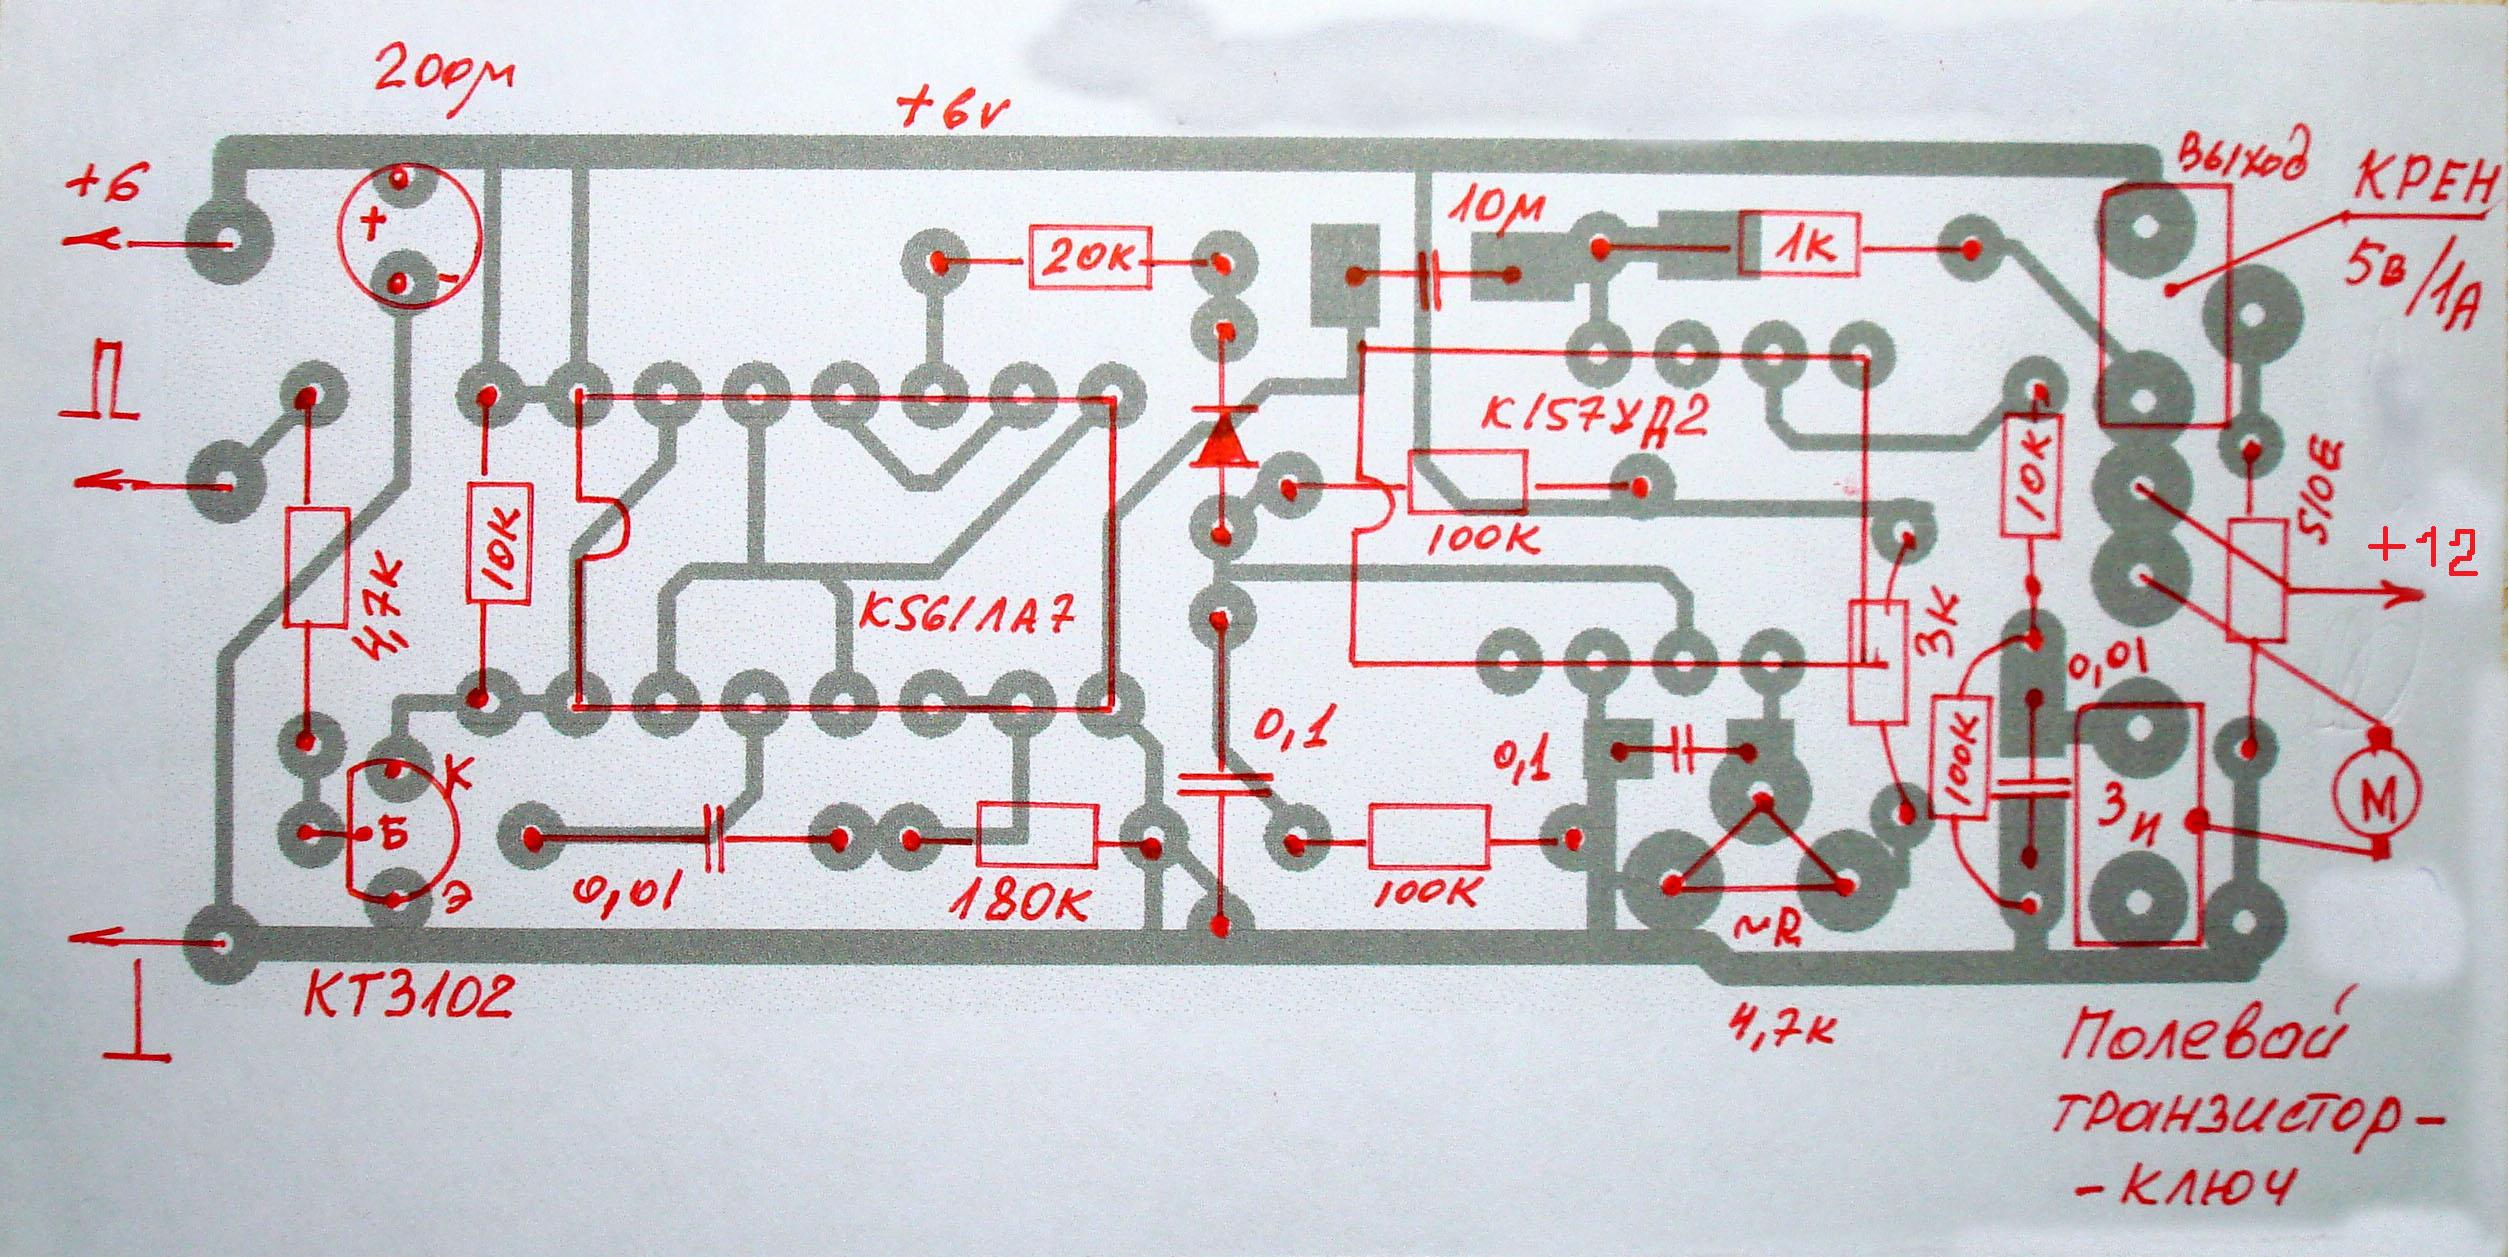 Схема регулятора хода для коллекторного мотора - Авто - Судомодели